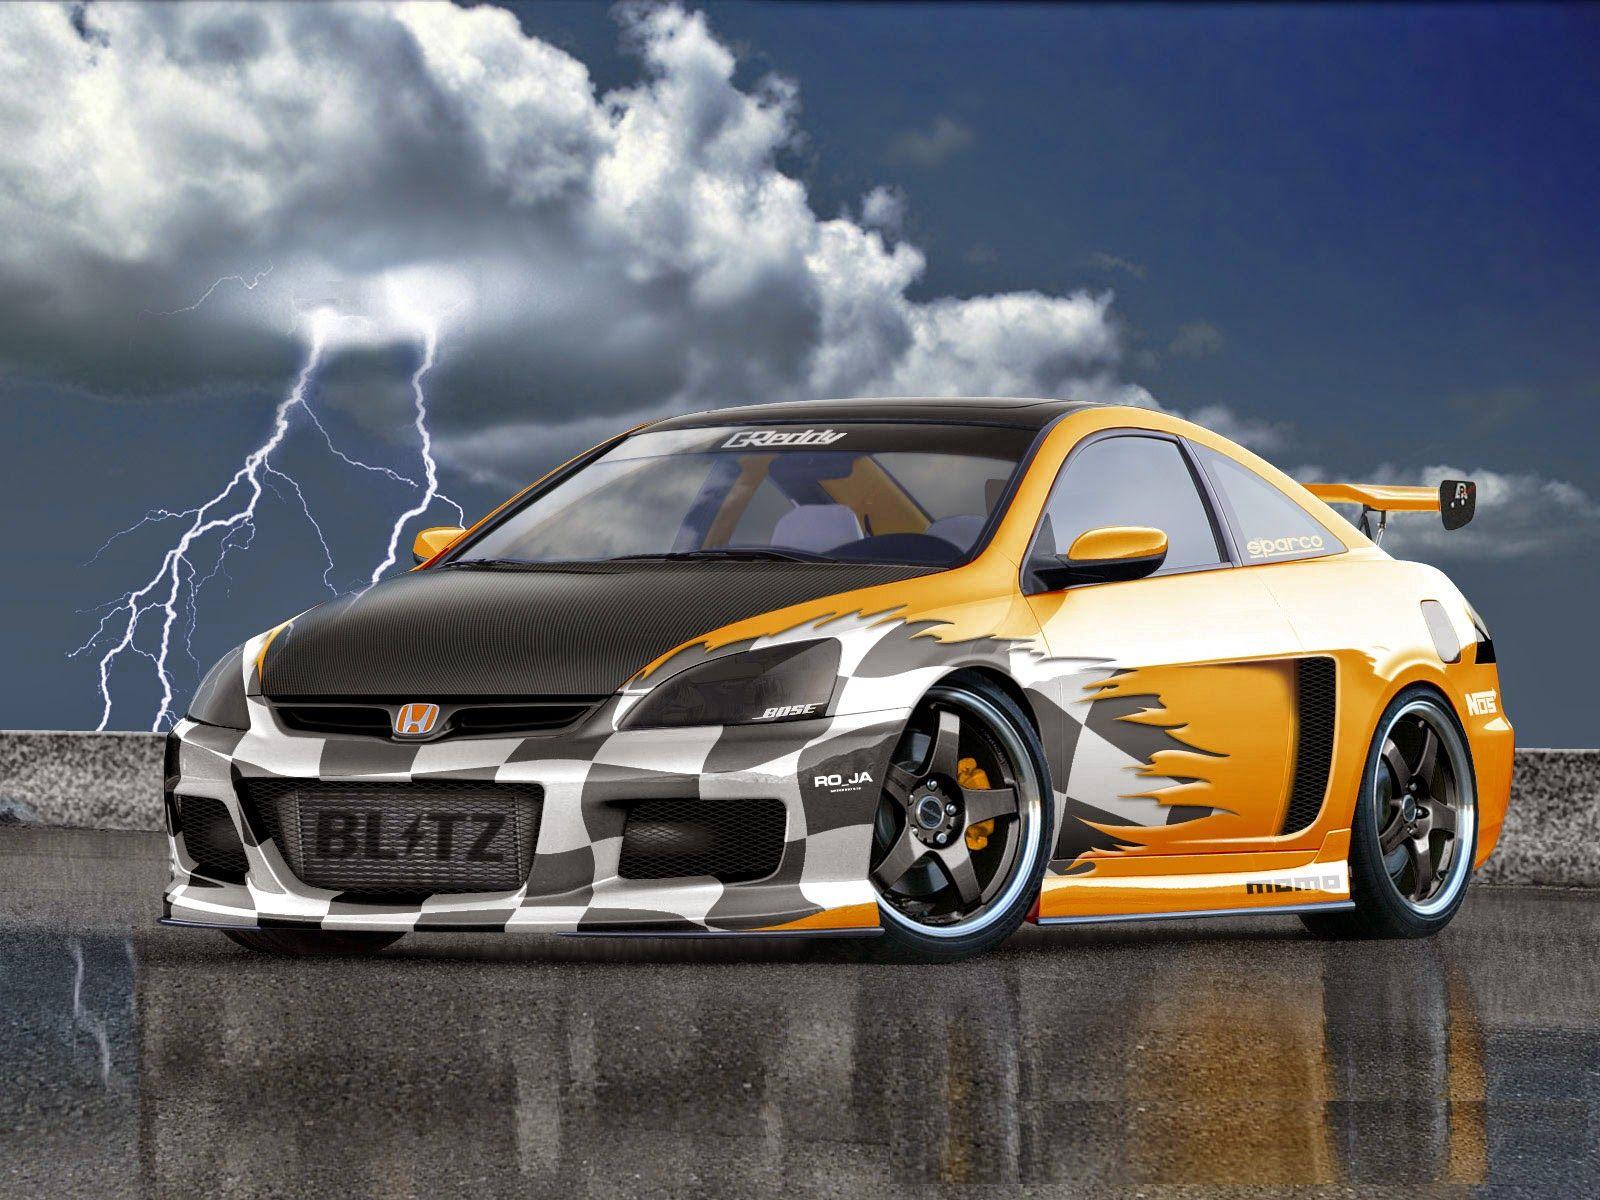 Honda Blitz Sports Car HD Wallpaper HD Wallpapers Pinterest